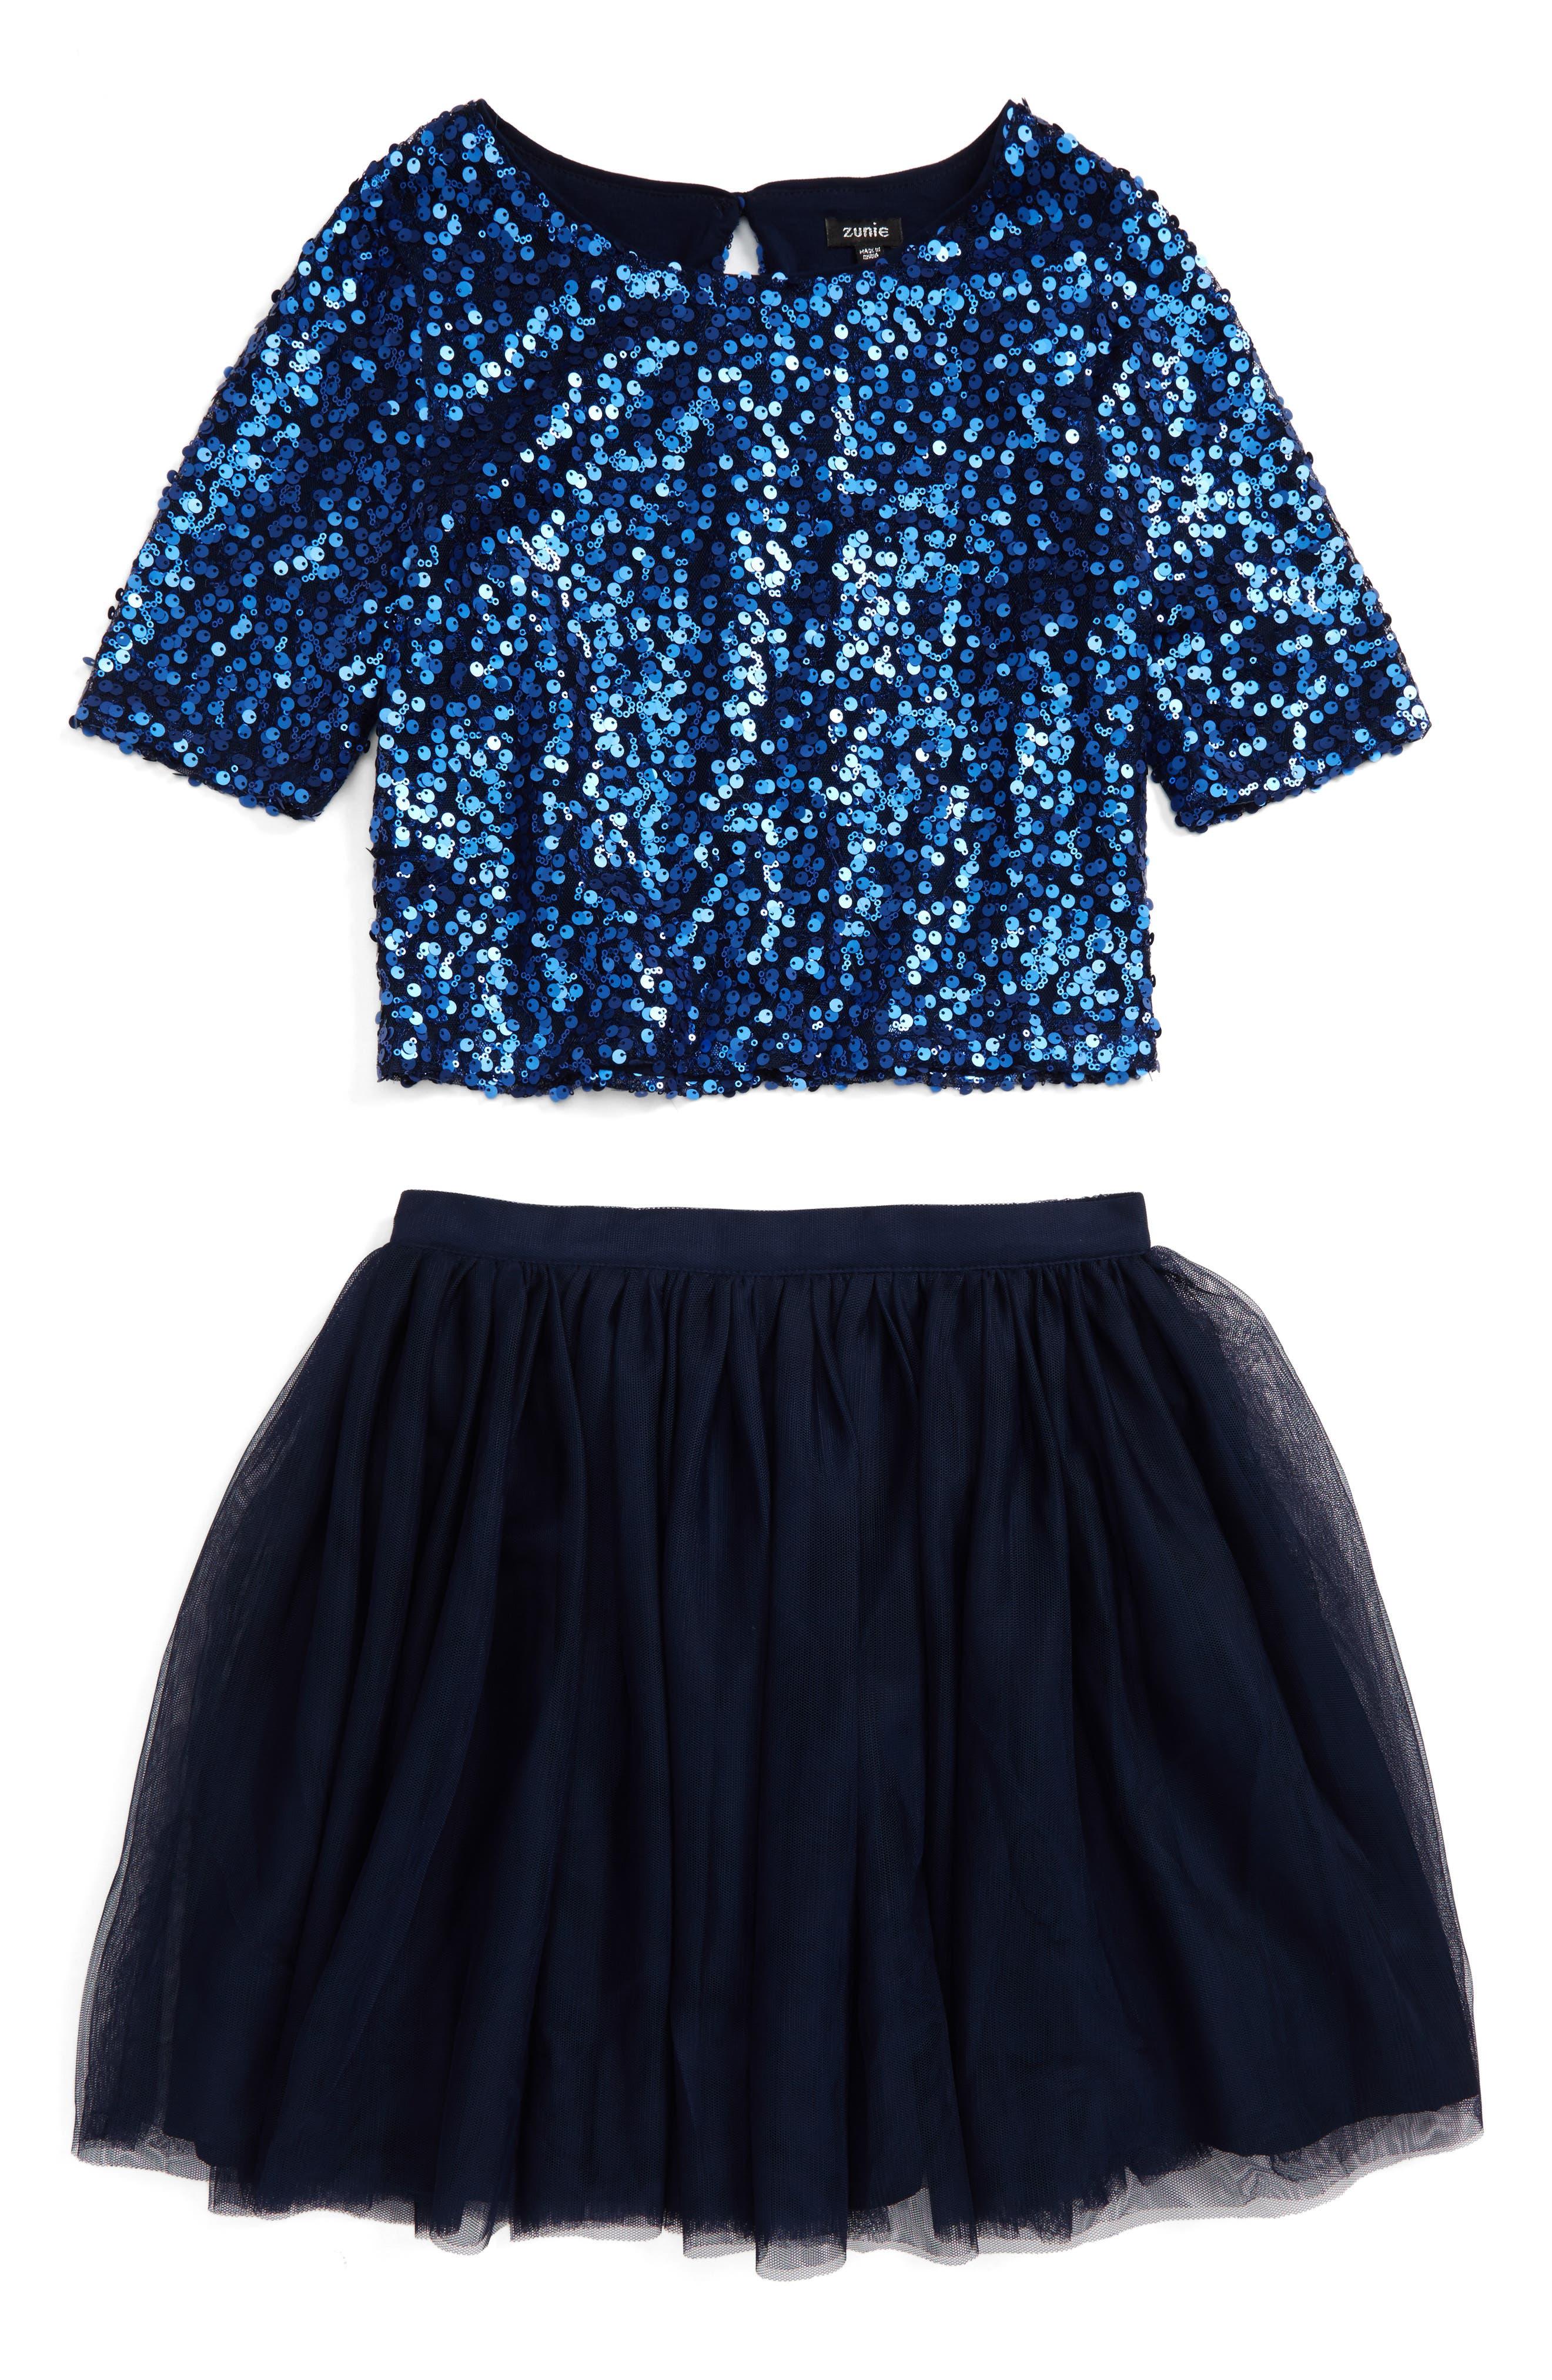 Main Image - Zunie Sequin Top & Tulle Skirt Set (Big Girls)